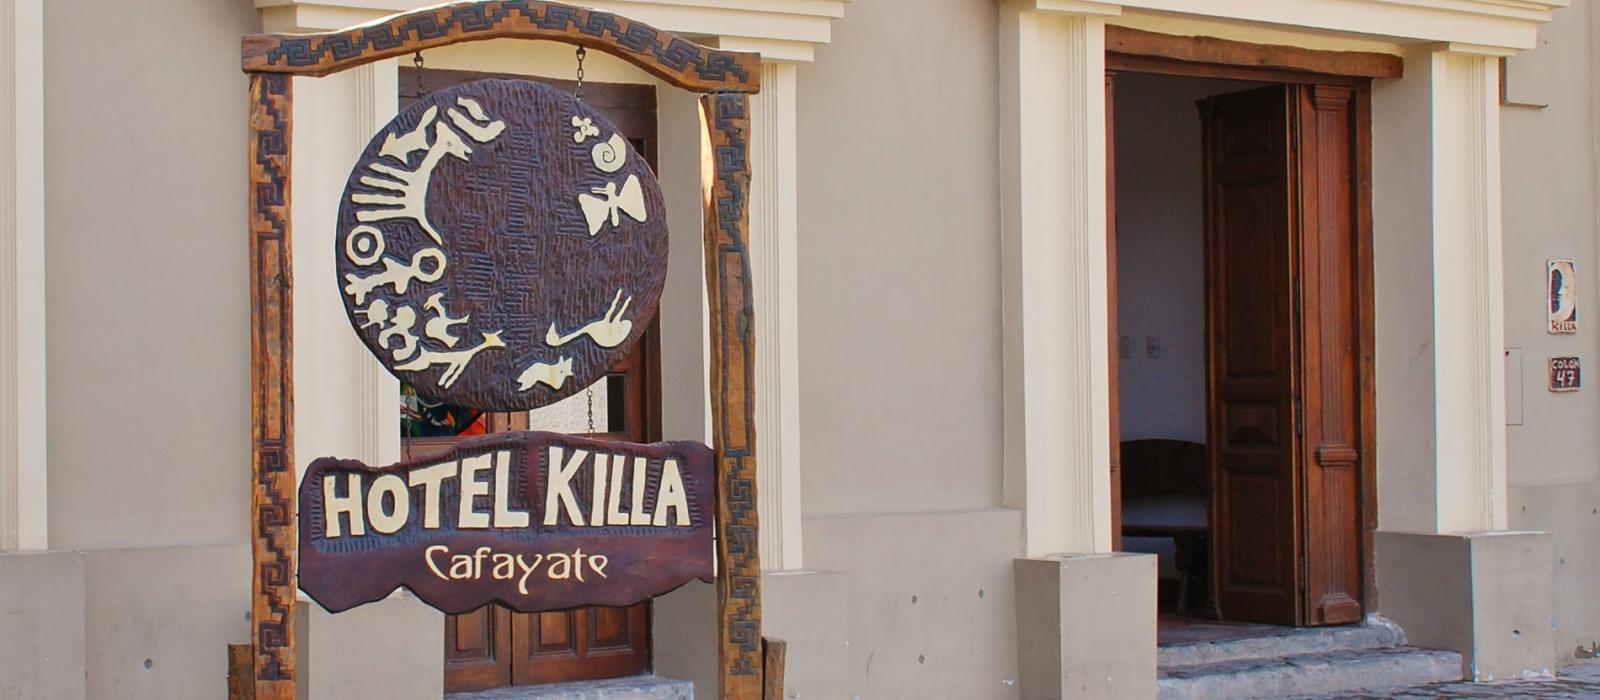 Hotel Killa Argentinien